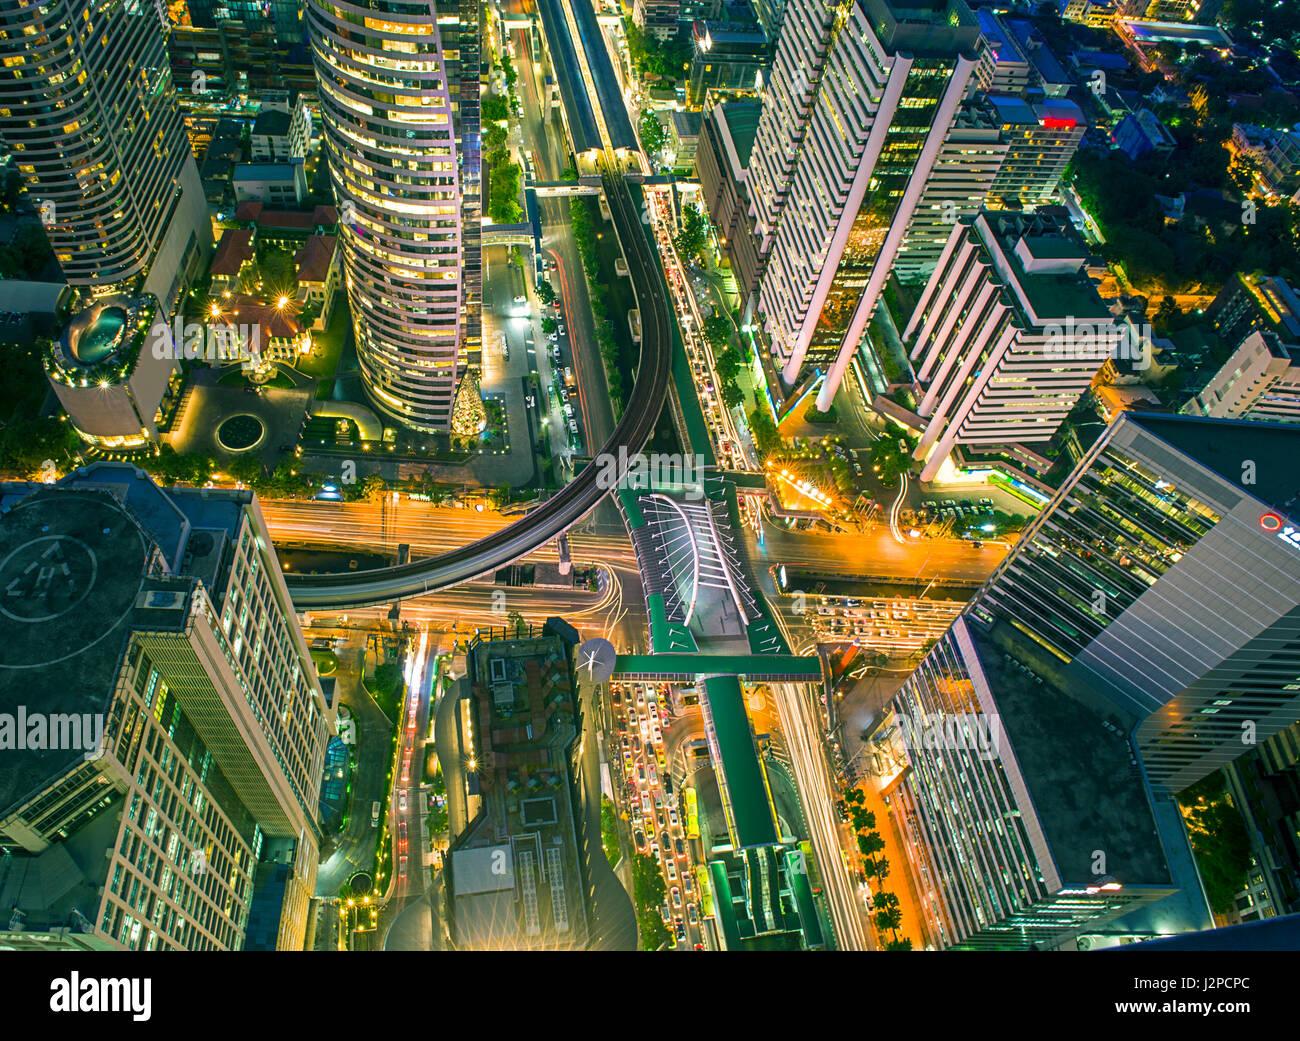 Central Business district, CBD of Bangkok on Sathorn road